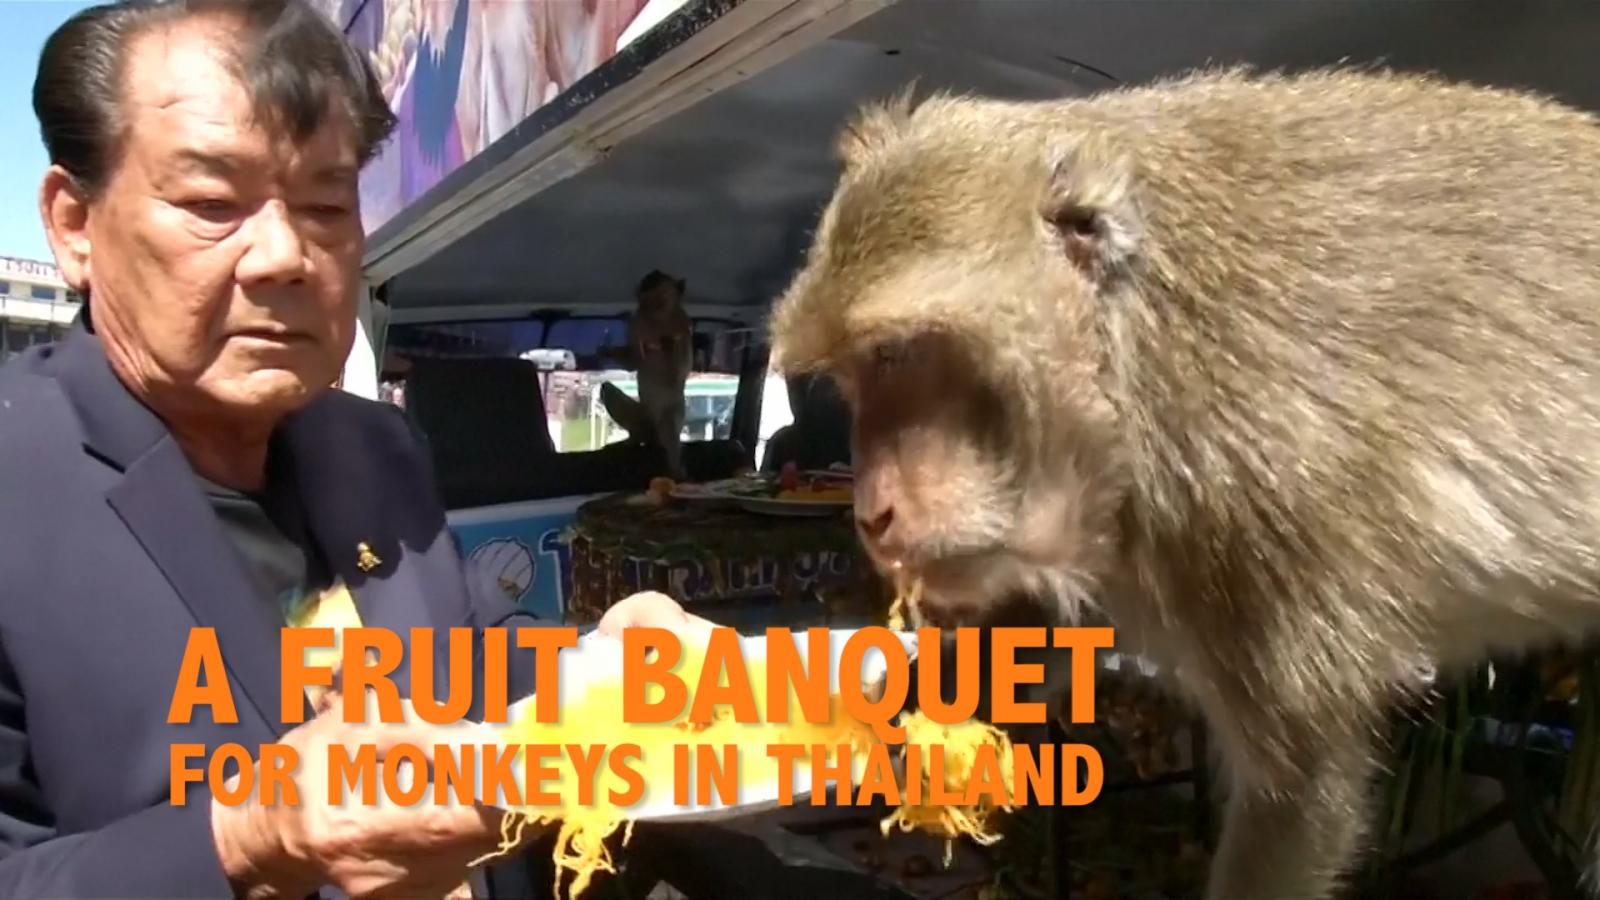 A fruit banquet for monkeys